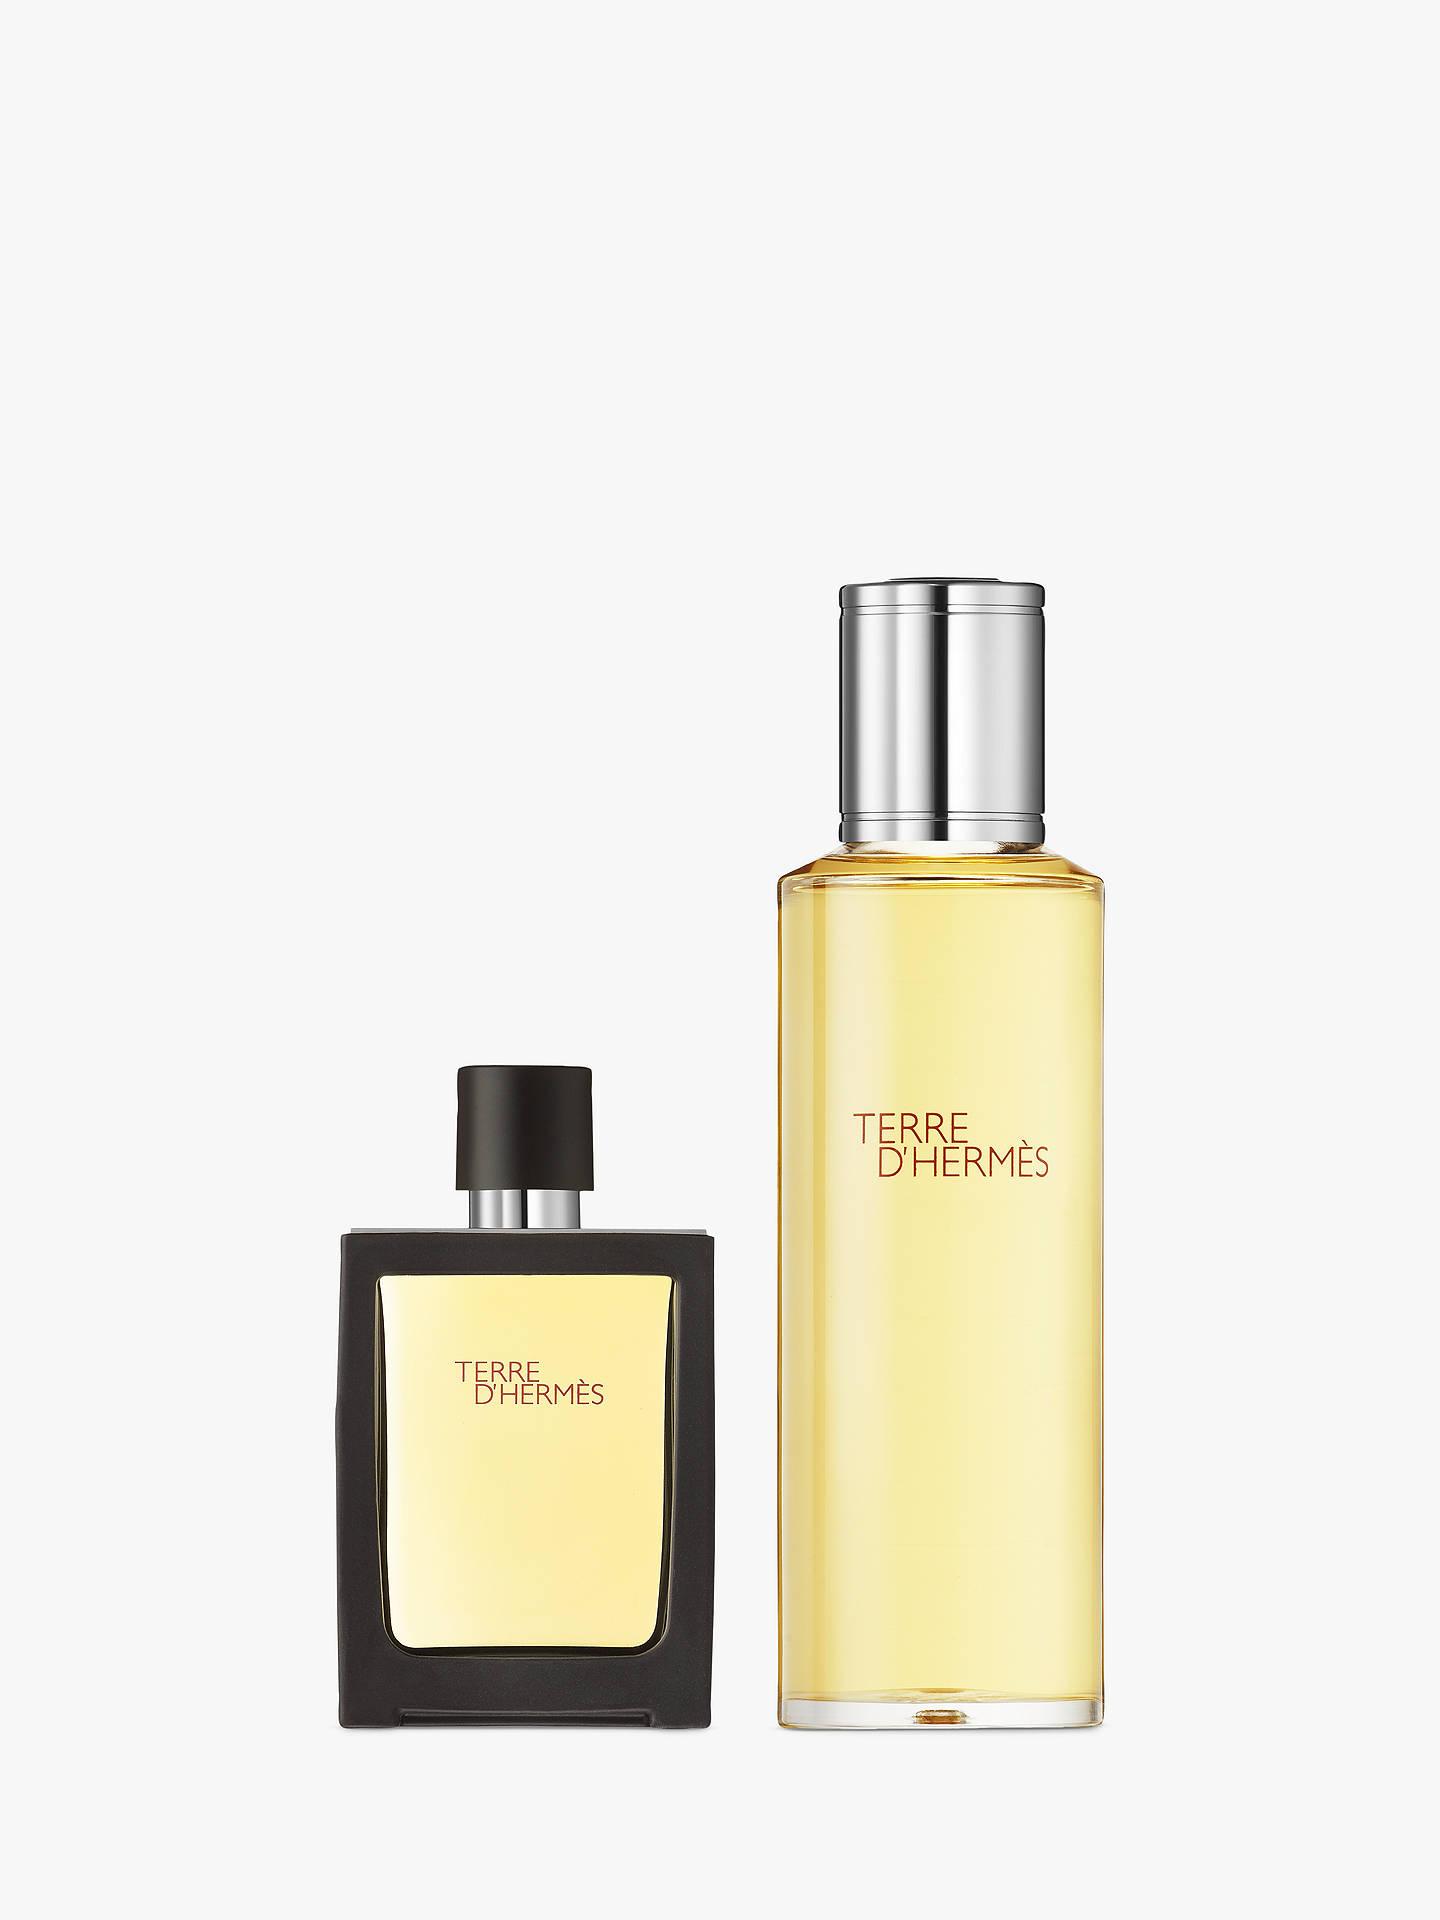 Hermès Terre Dhermès Parfum 30ml Recharge 125ml At John Lewis